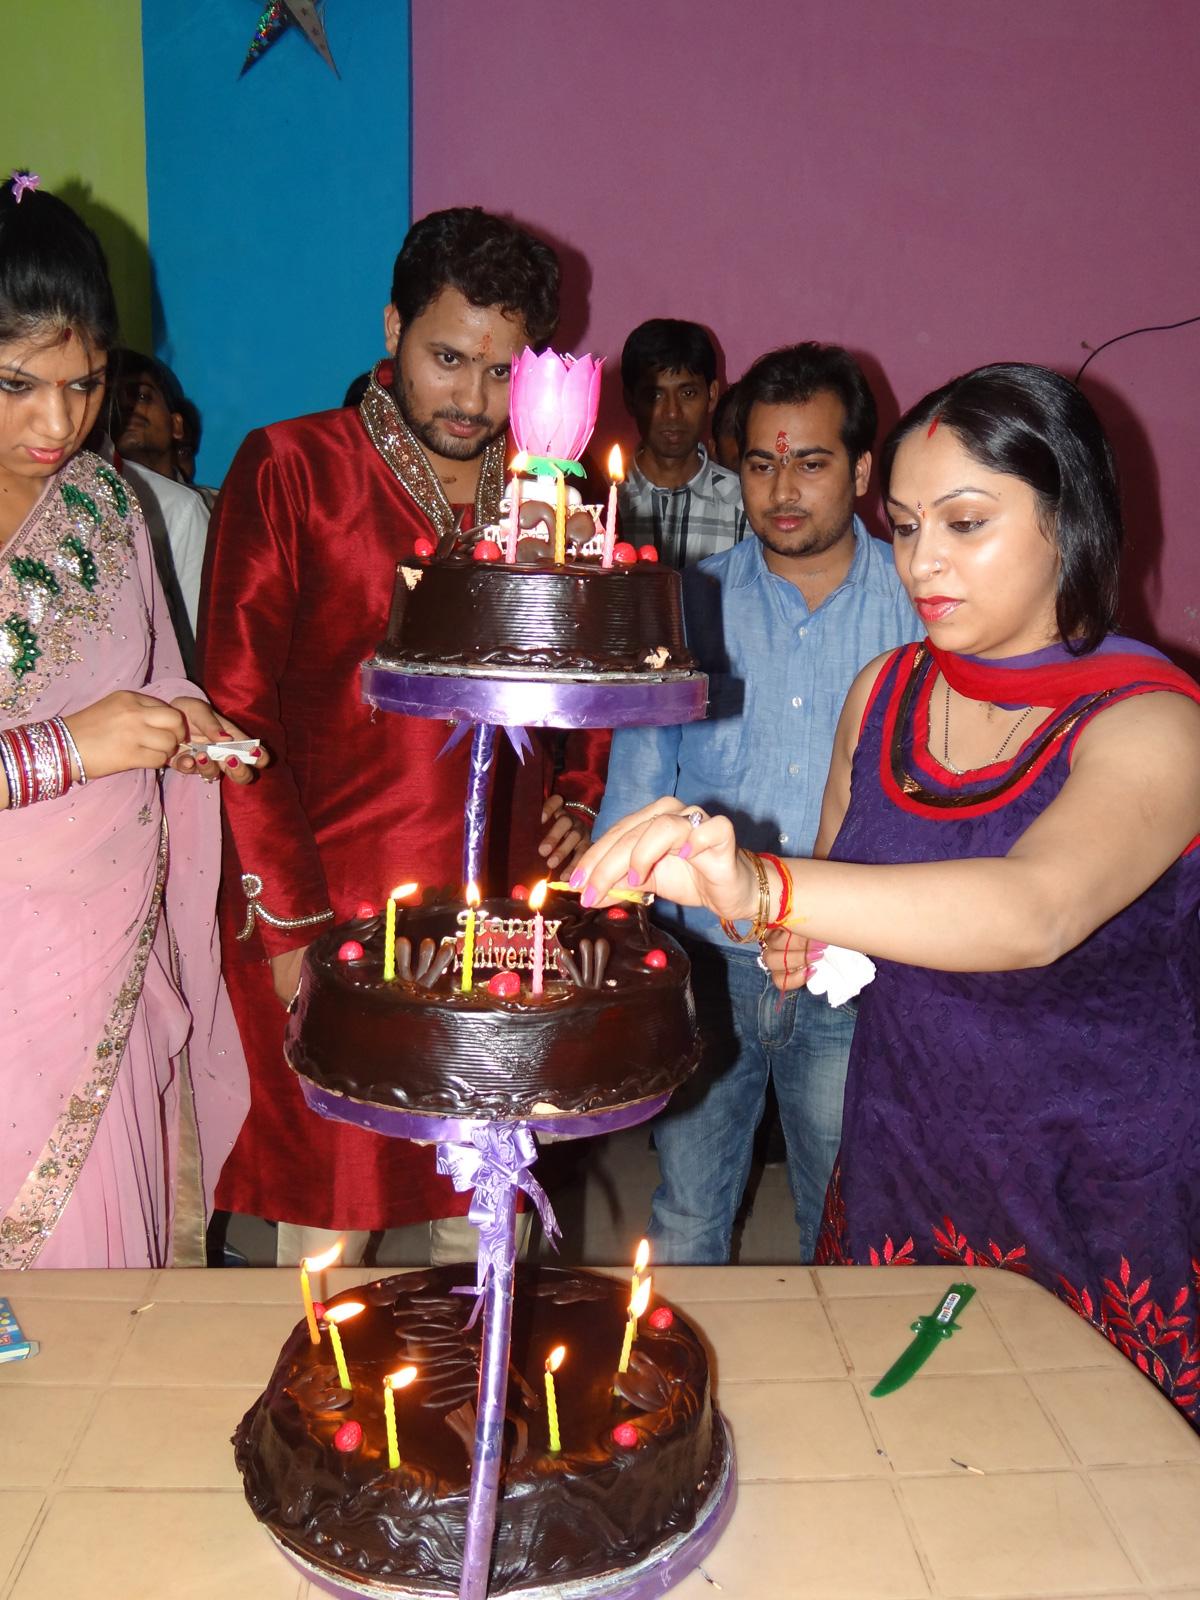 Cake Celebration